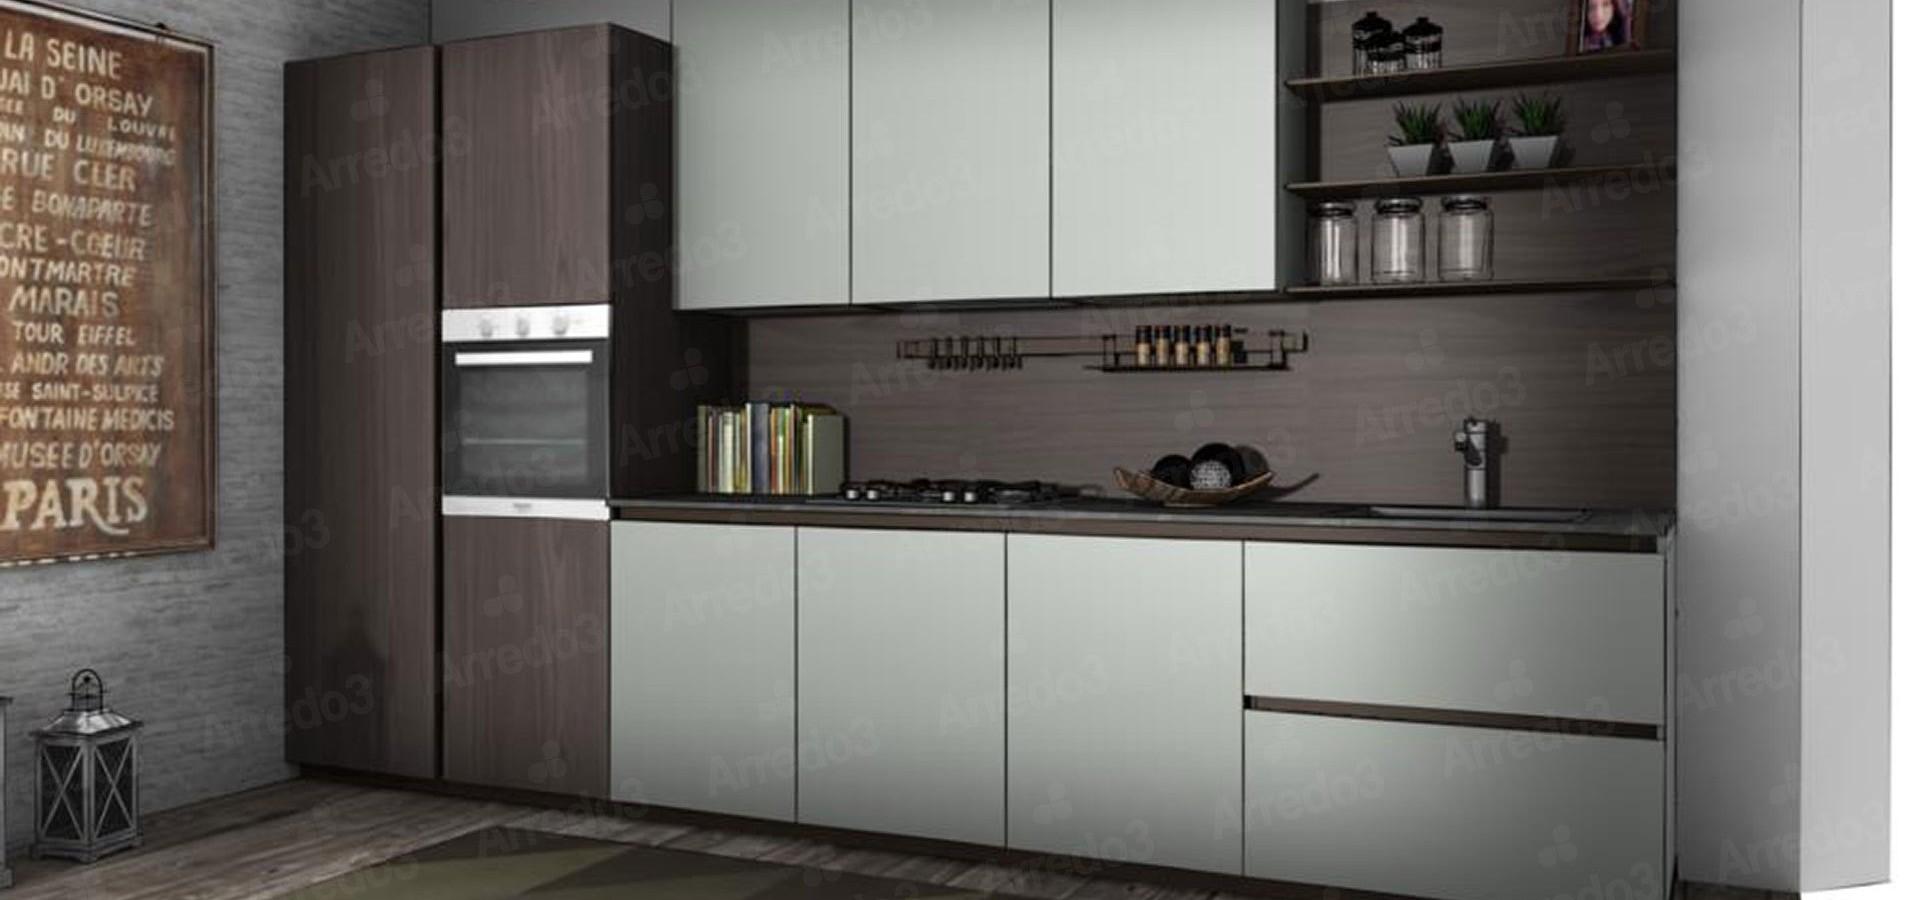 Итальянская Кухня KALI LM04 | Цена на Кухня KALI LM04 ARREDO3